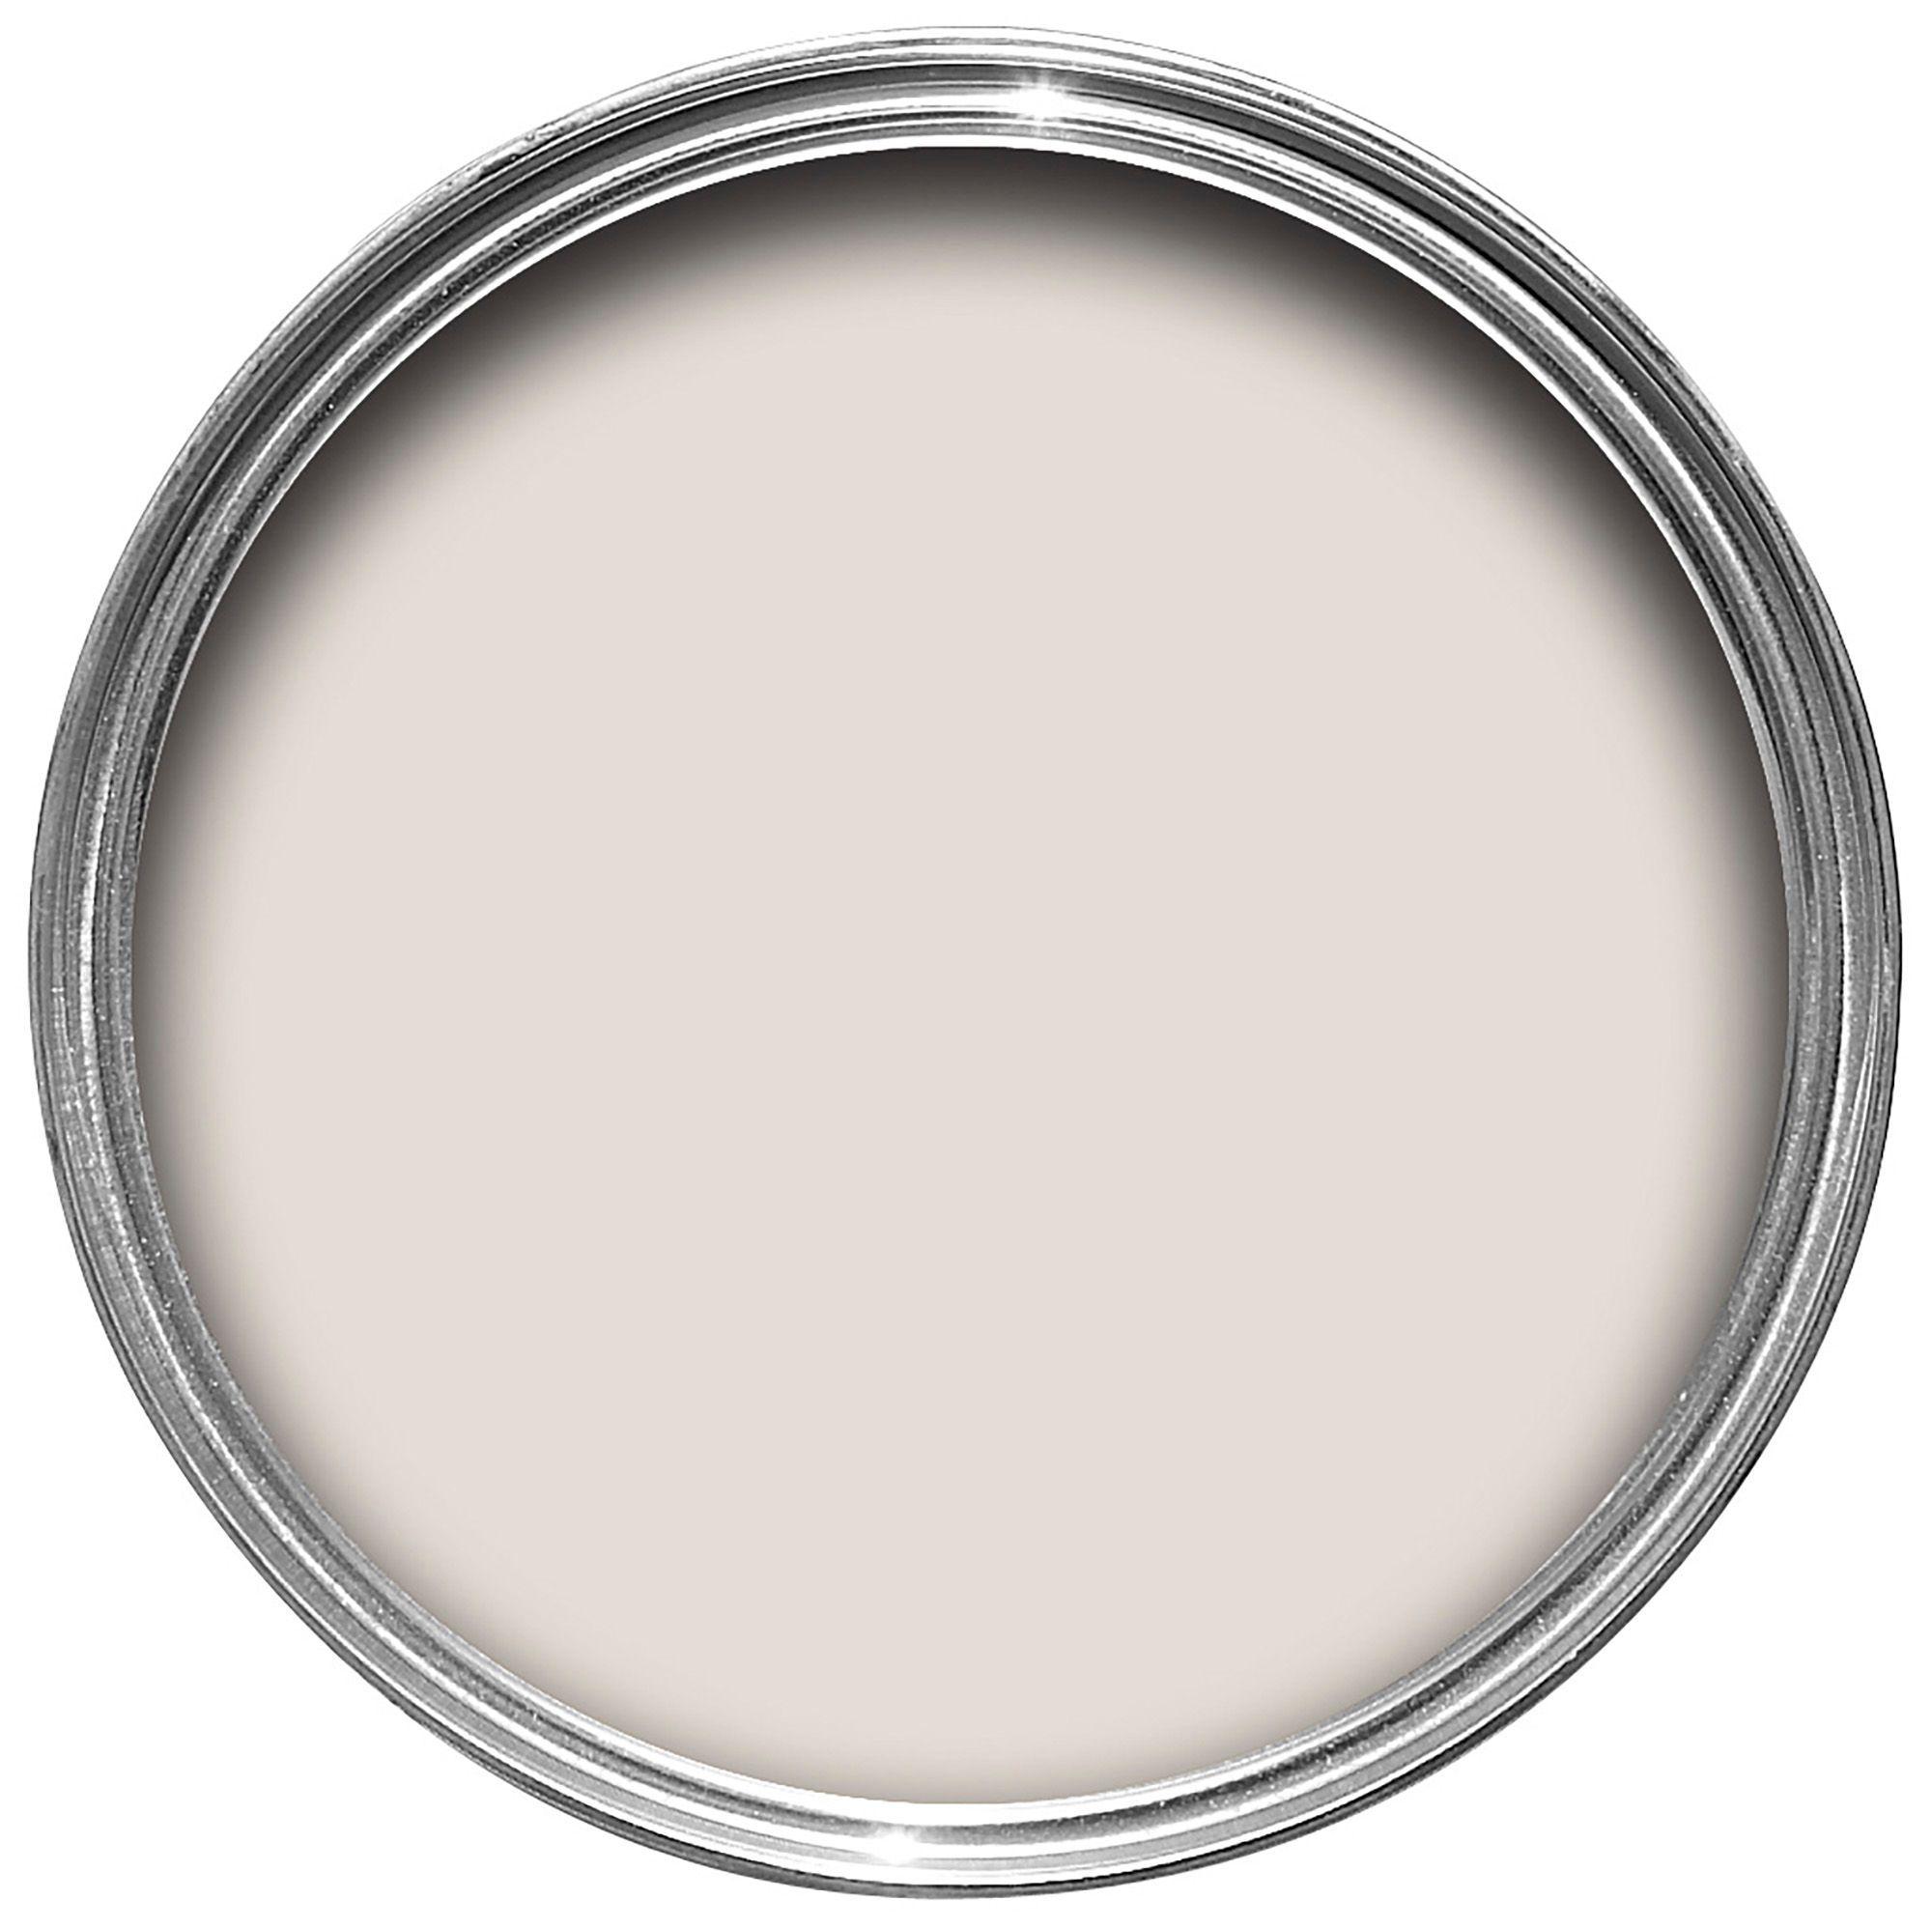 dulux endurance nutmeg white matt emulsion paint 50ml. Black Bedroom Furniture Sets. Home Design Ideas